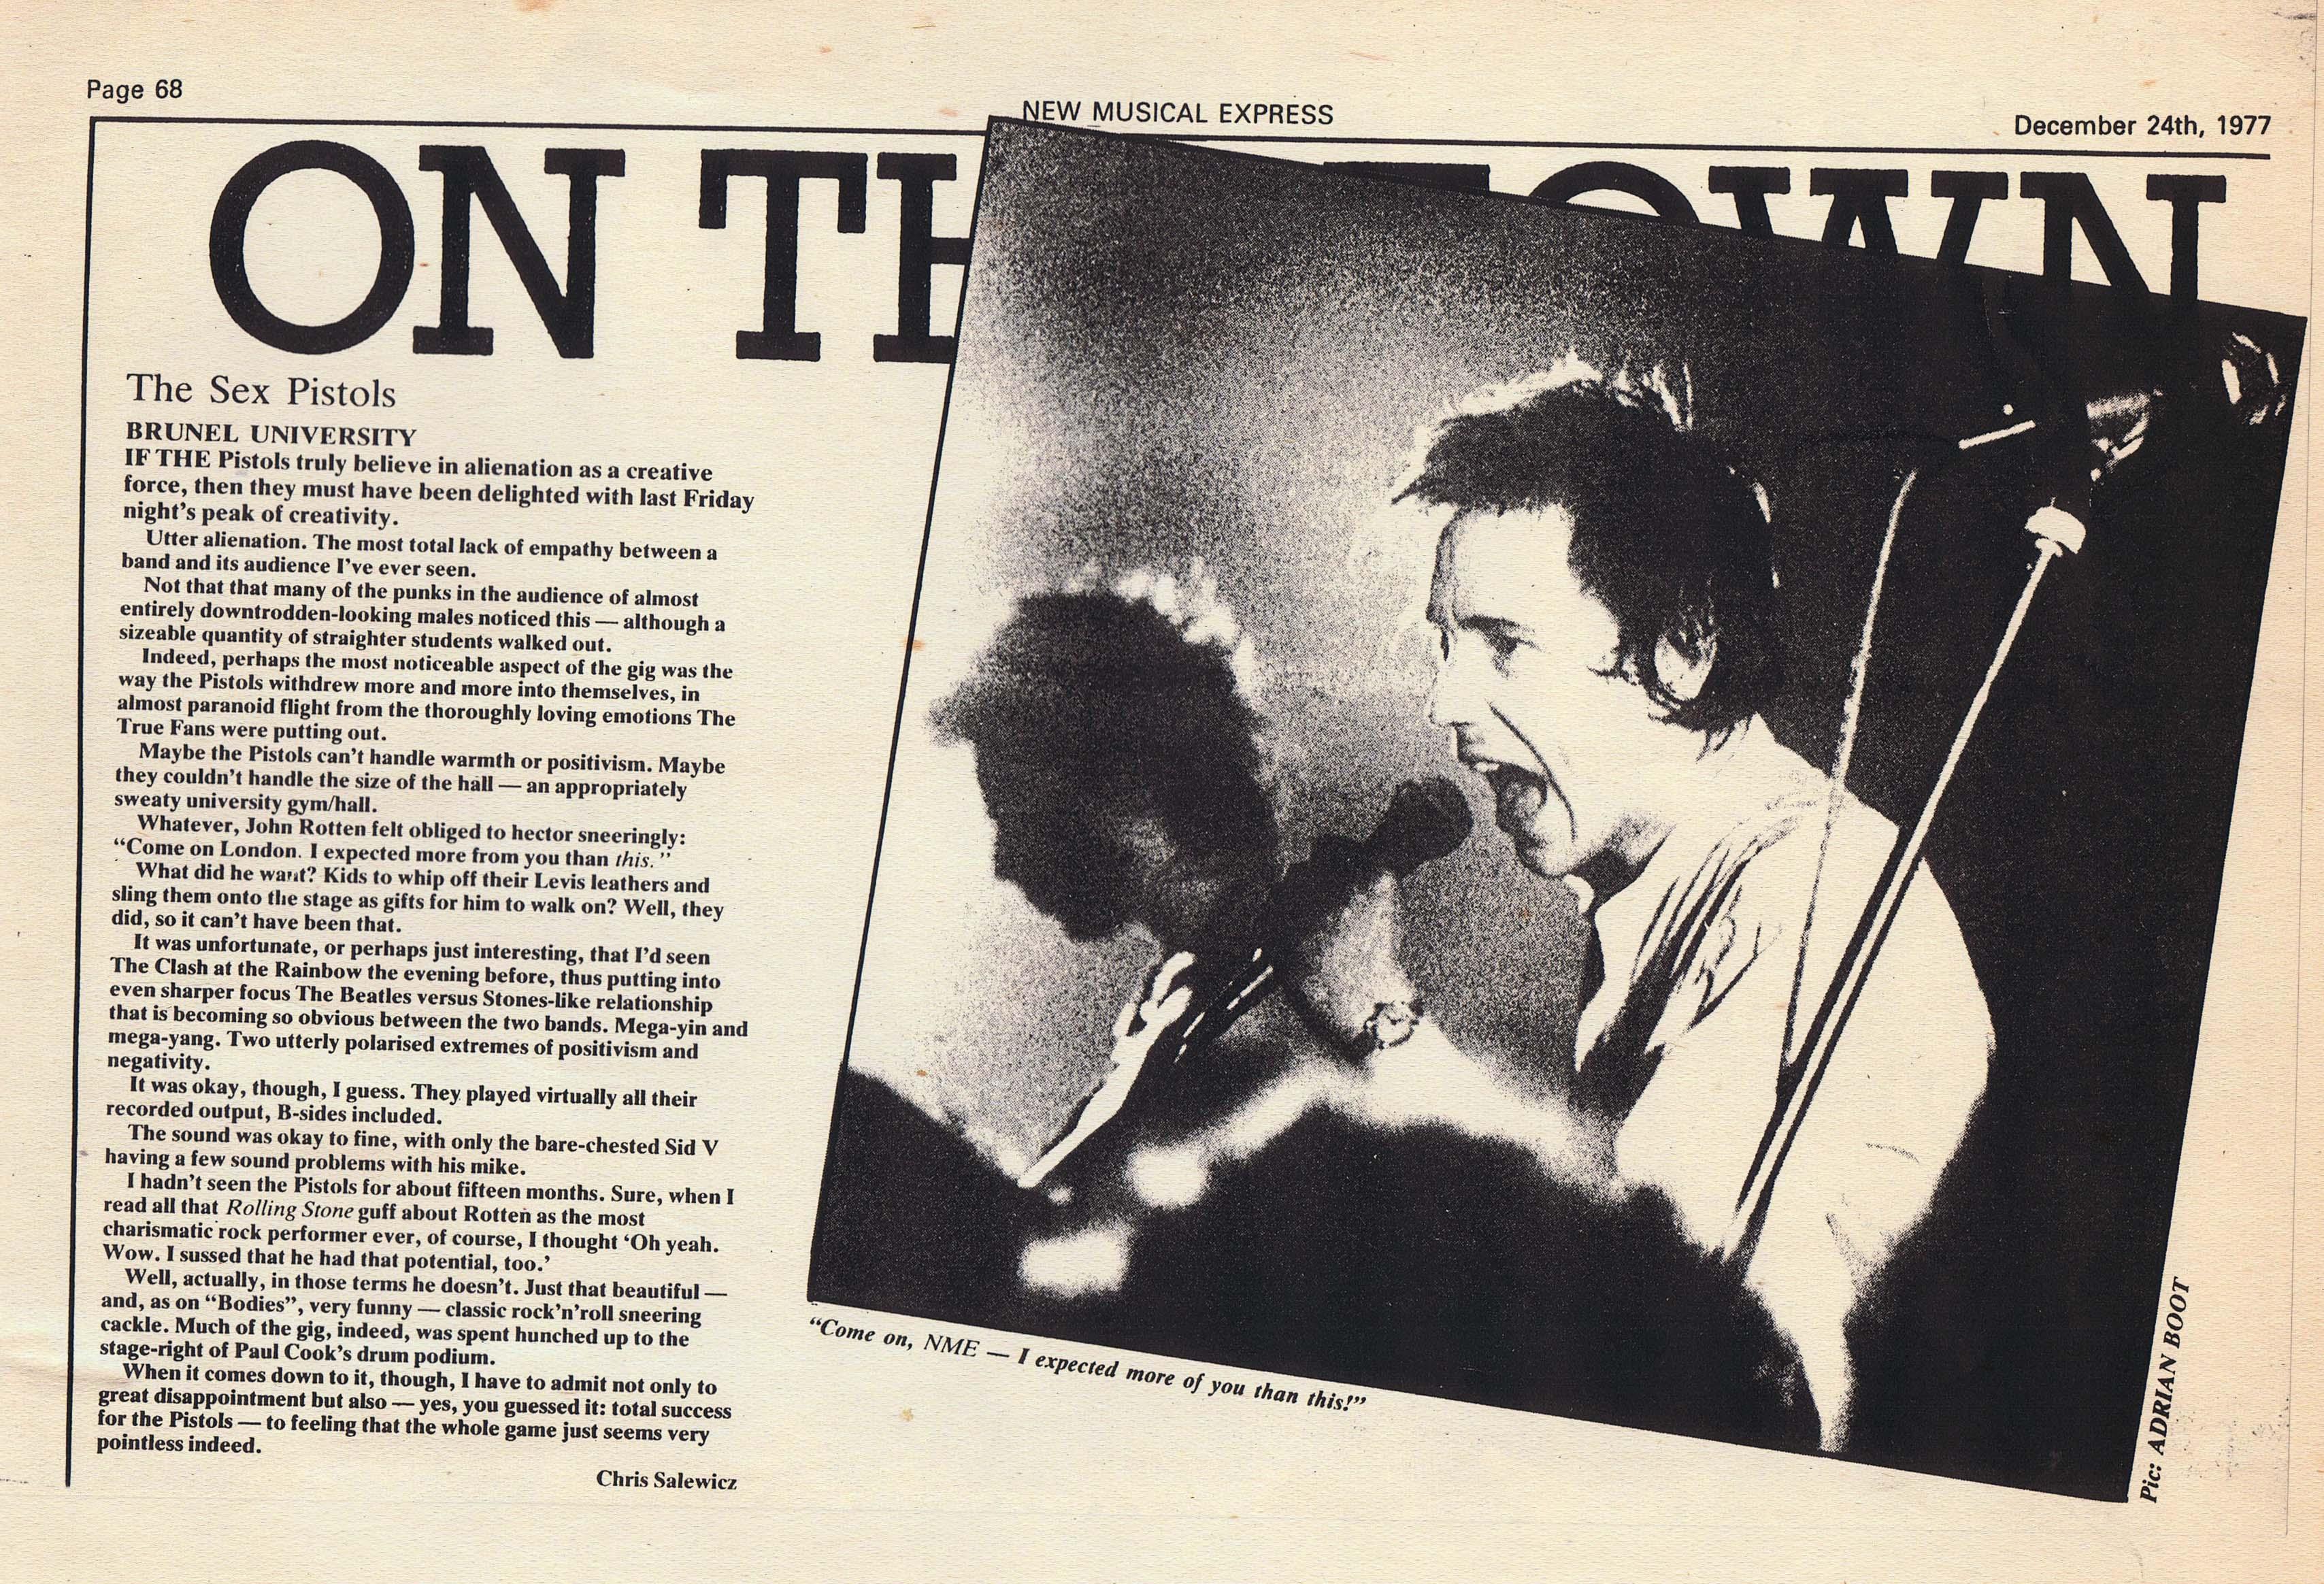 NME, December 24th 1977